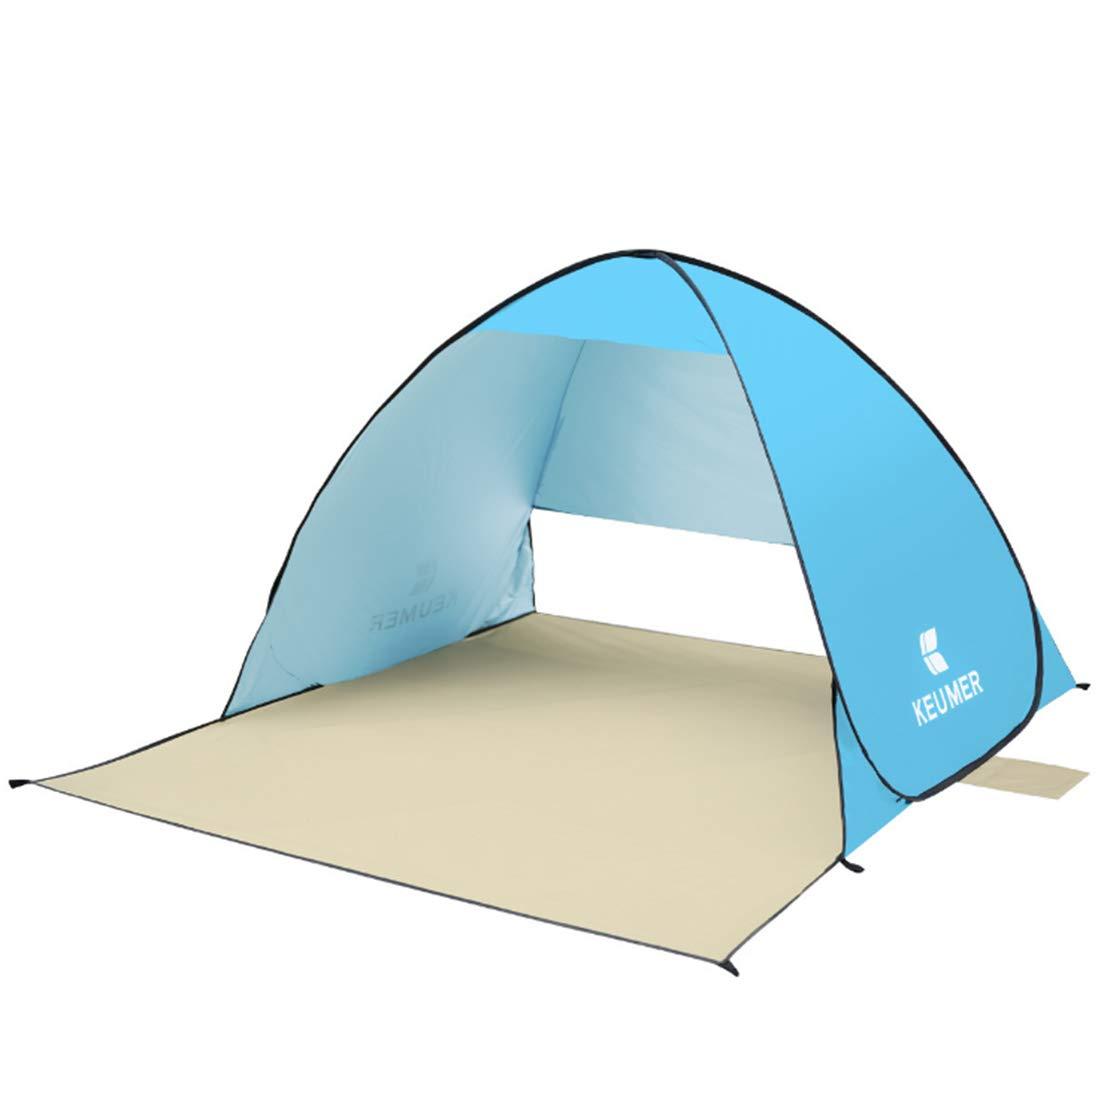 Ploekgda Outdoor Camping für 2 Personen Zehn (Farbe : Blau)